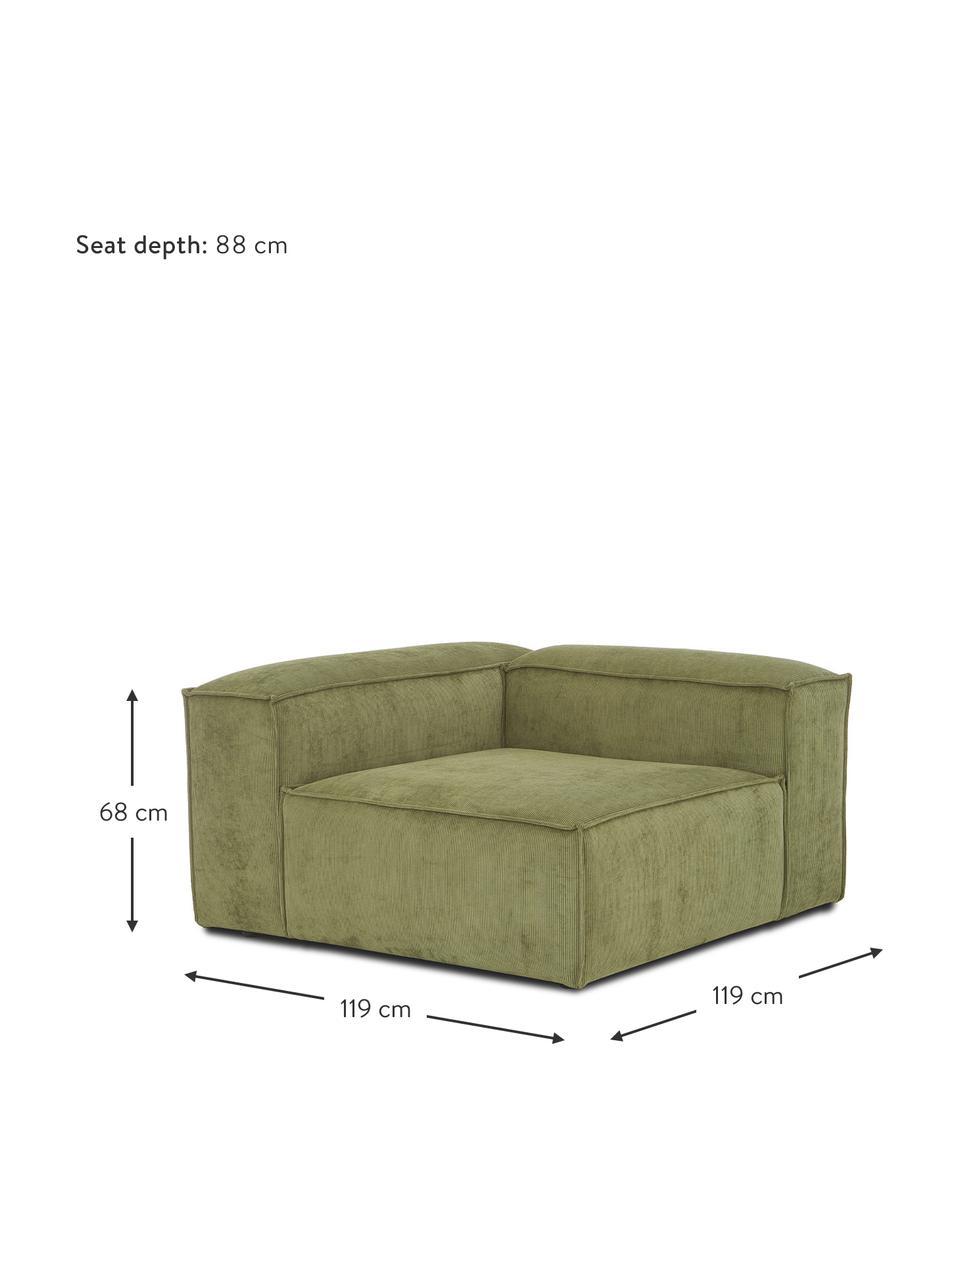 Eckmodul Lennon in Grün aus Cord, Bezug: Cord (92% Polyester, 8% P, Gestell: Massives Kiefernholz, Spe, Füße: Kunststoff Die Füße befin, Cord Grün, B 119 x T 119 cm